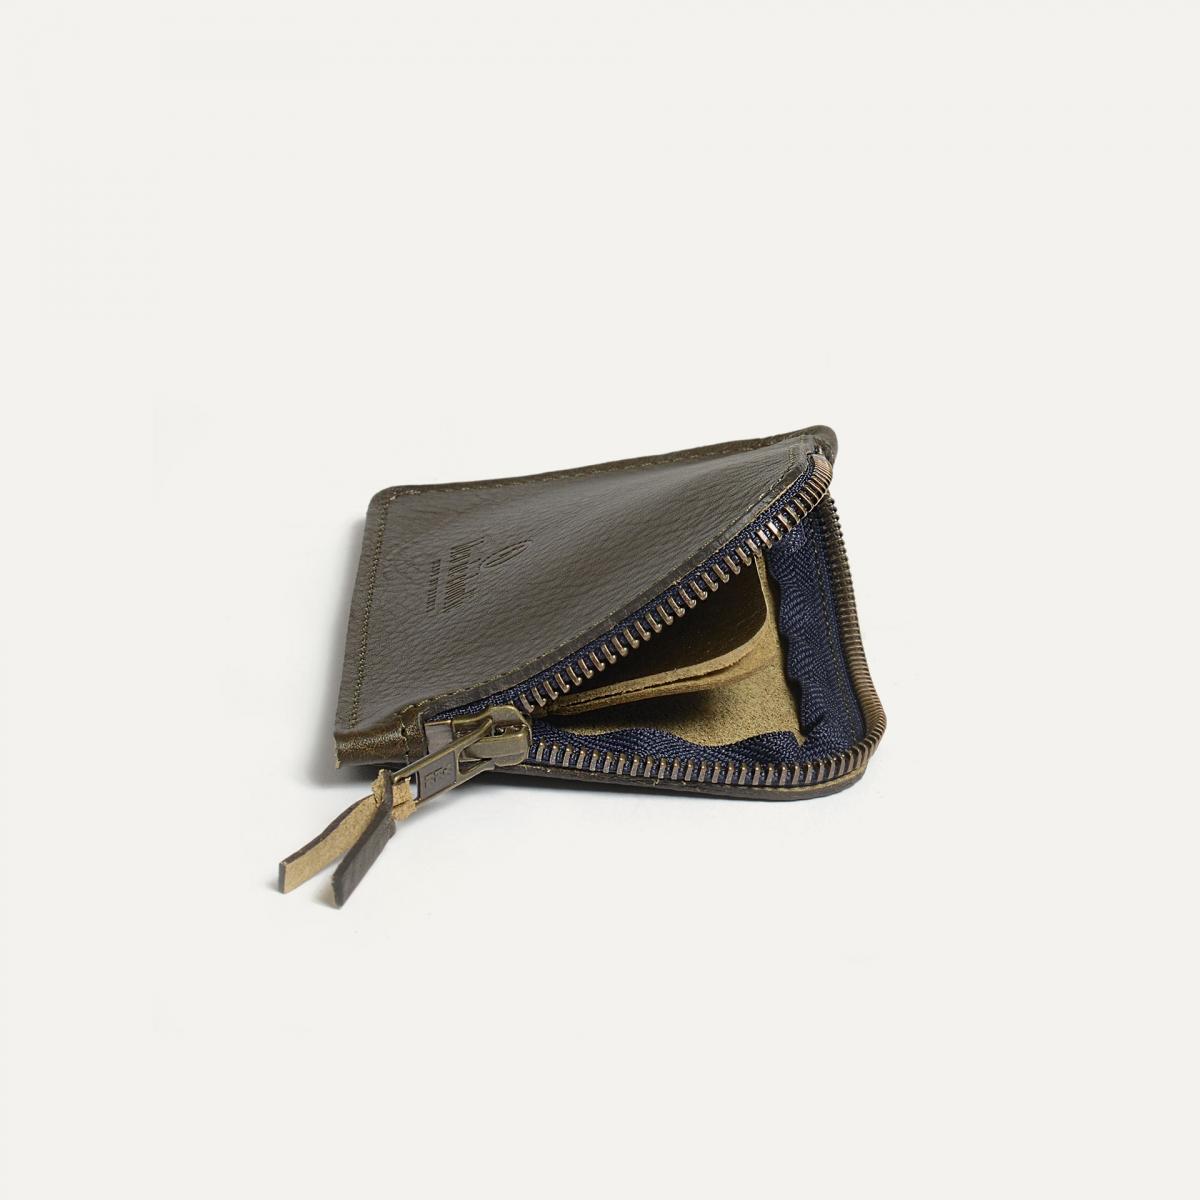 Porte monnaie zippé As / M - Kaki (image n°3)